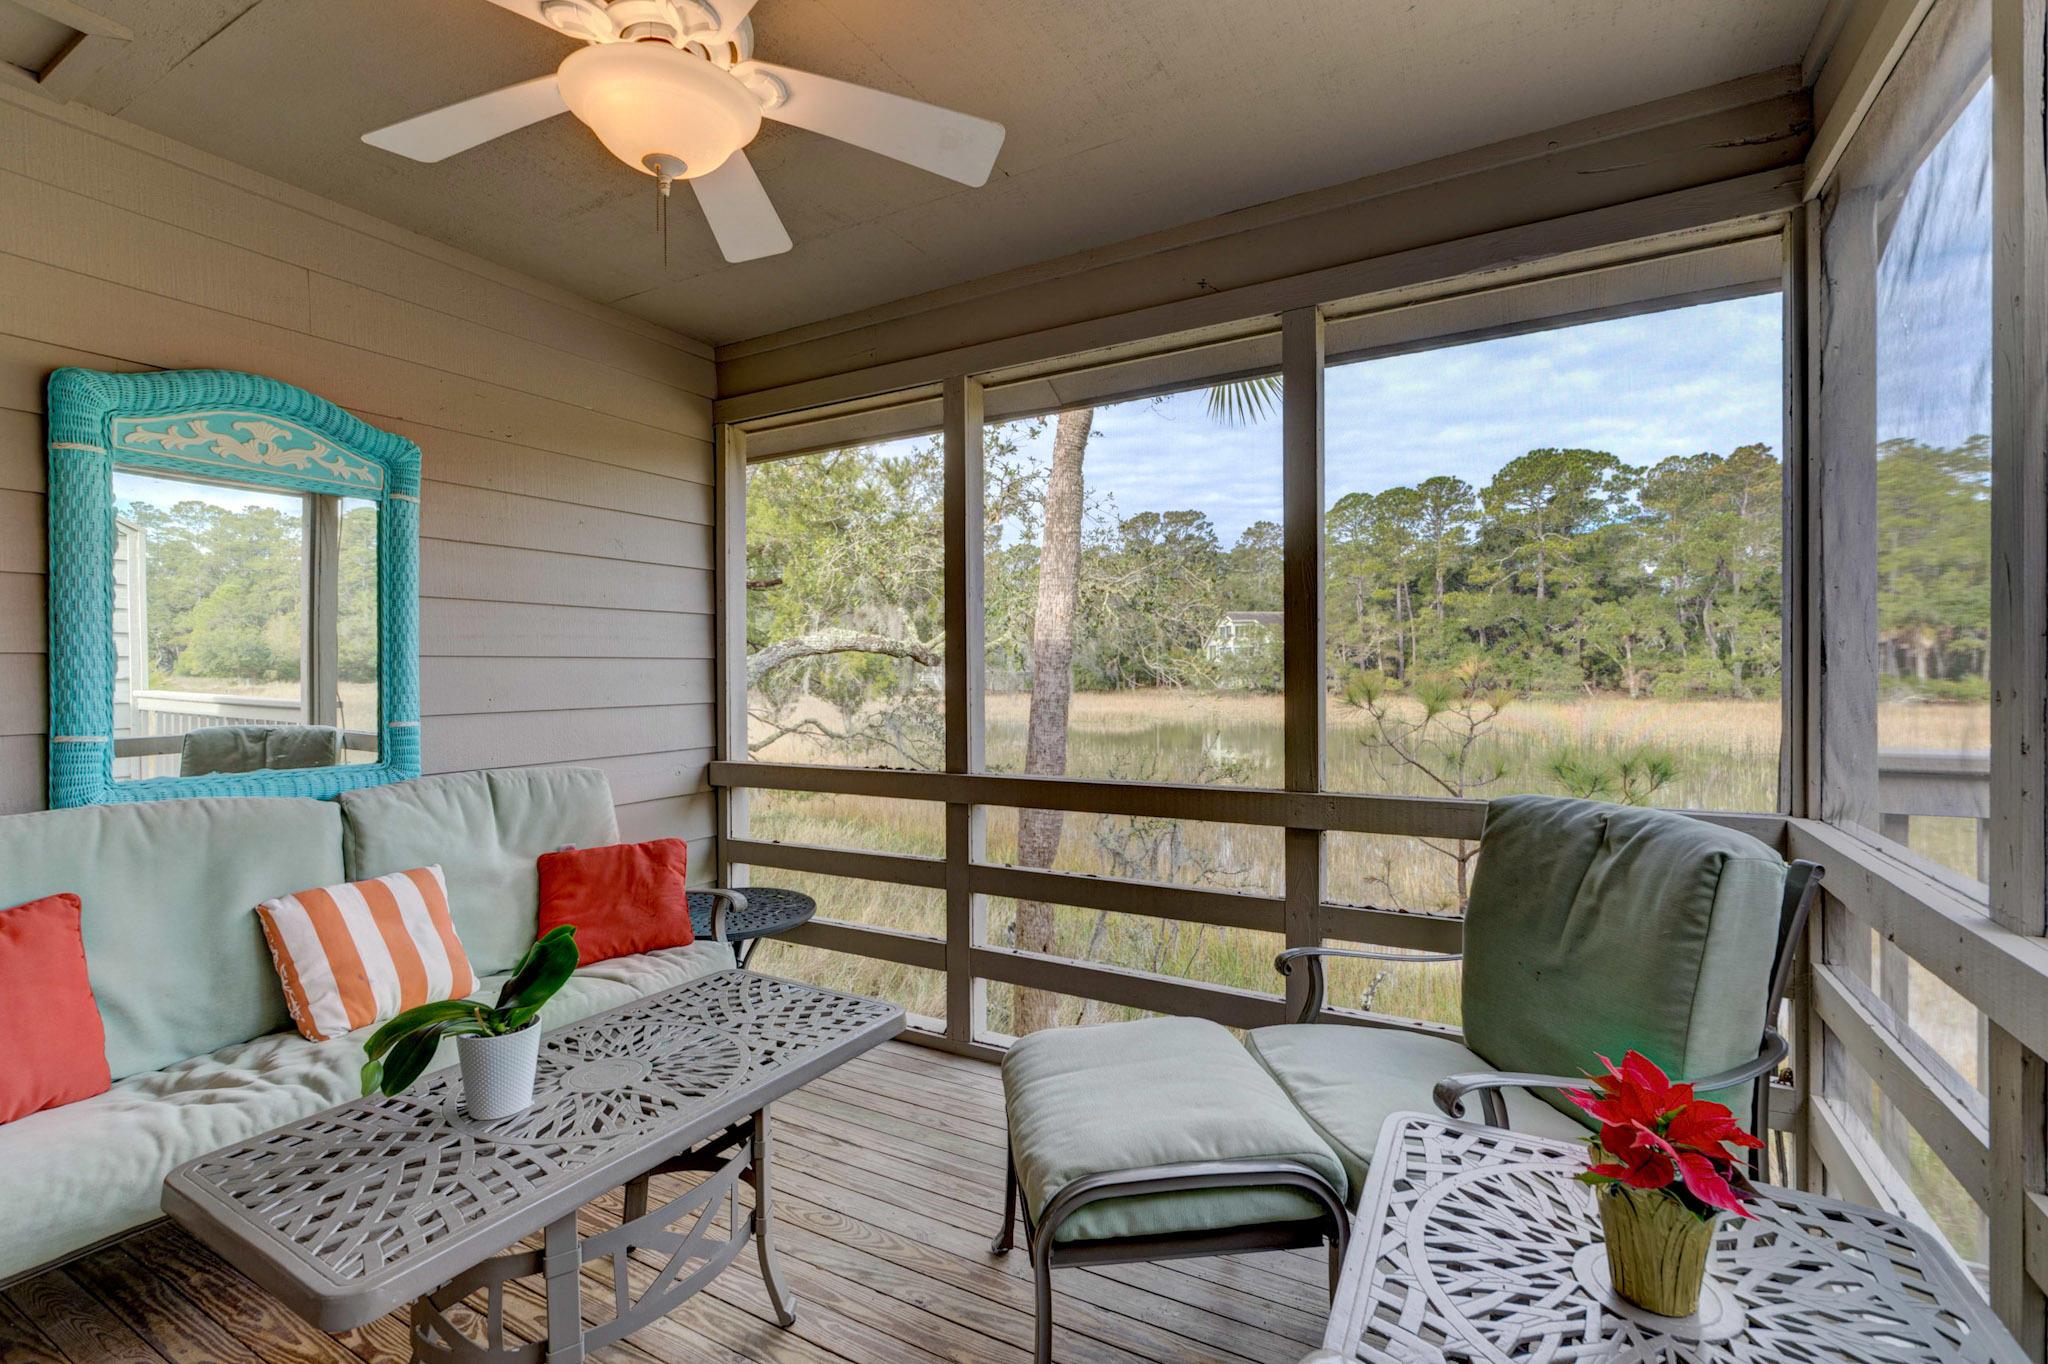 Creek Watch Villas Homes For Sale - 1244 Creek Watch, Johns Island, SC - 2